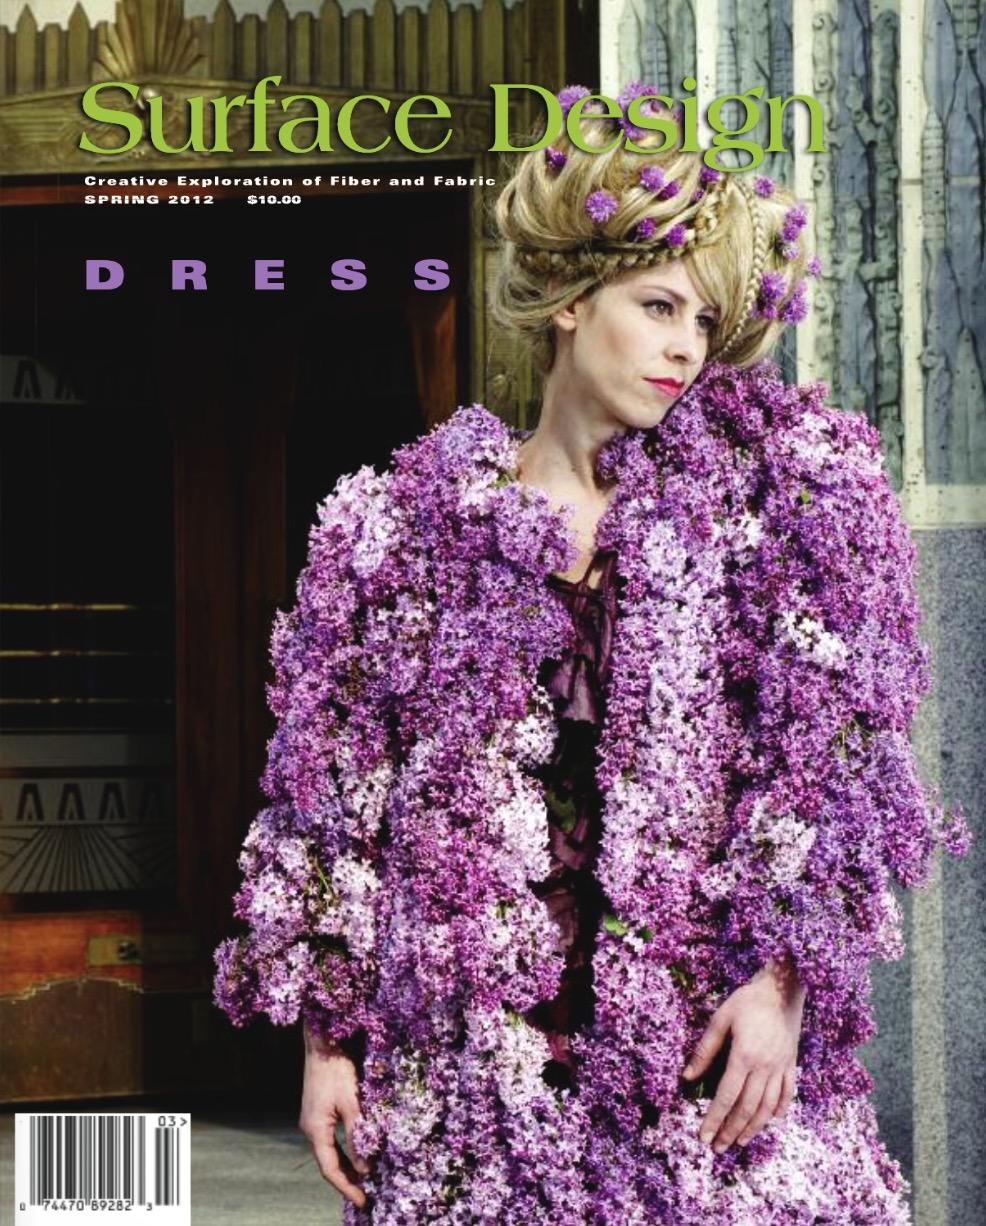 Dress, Spring 2012 Digital Journal Cover